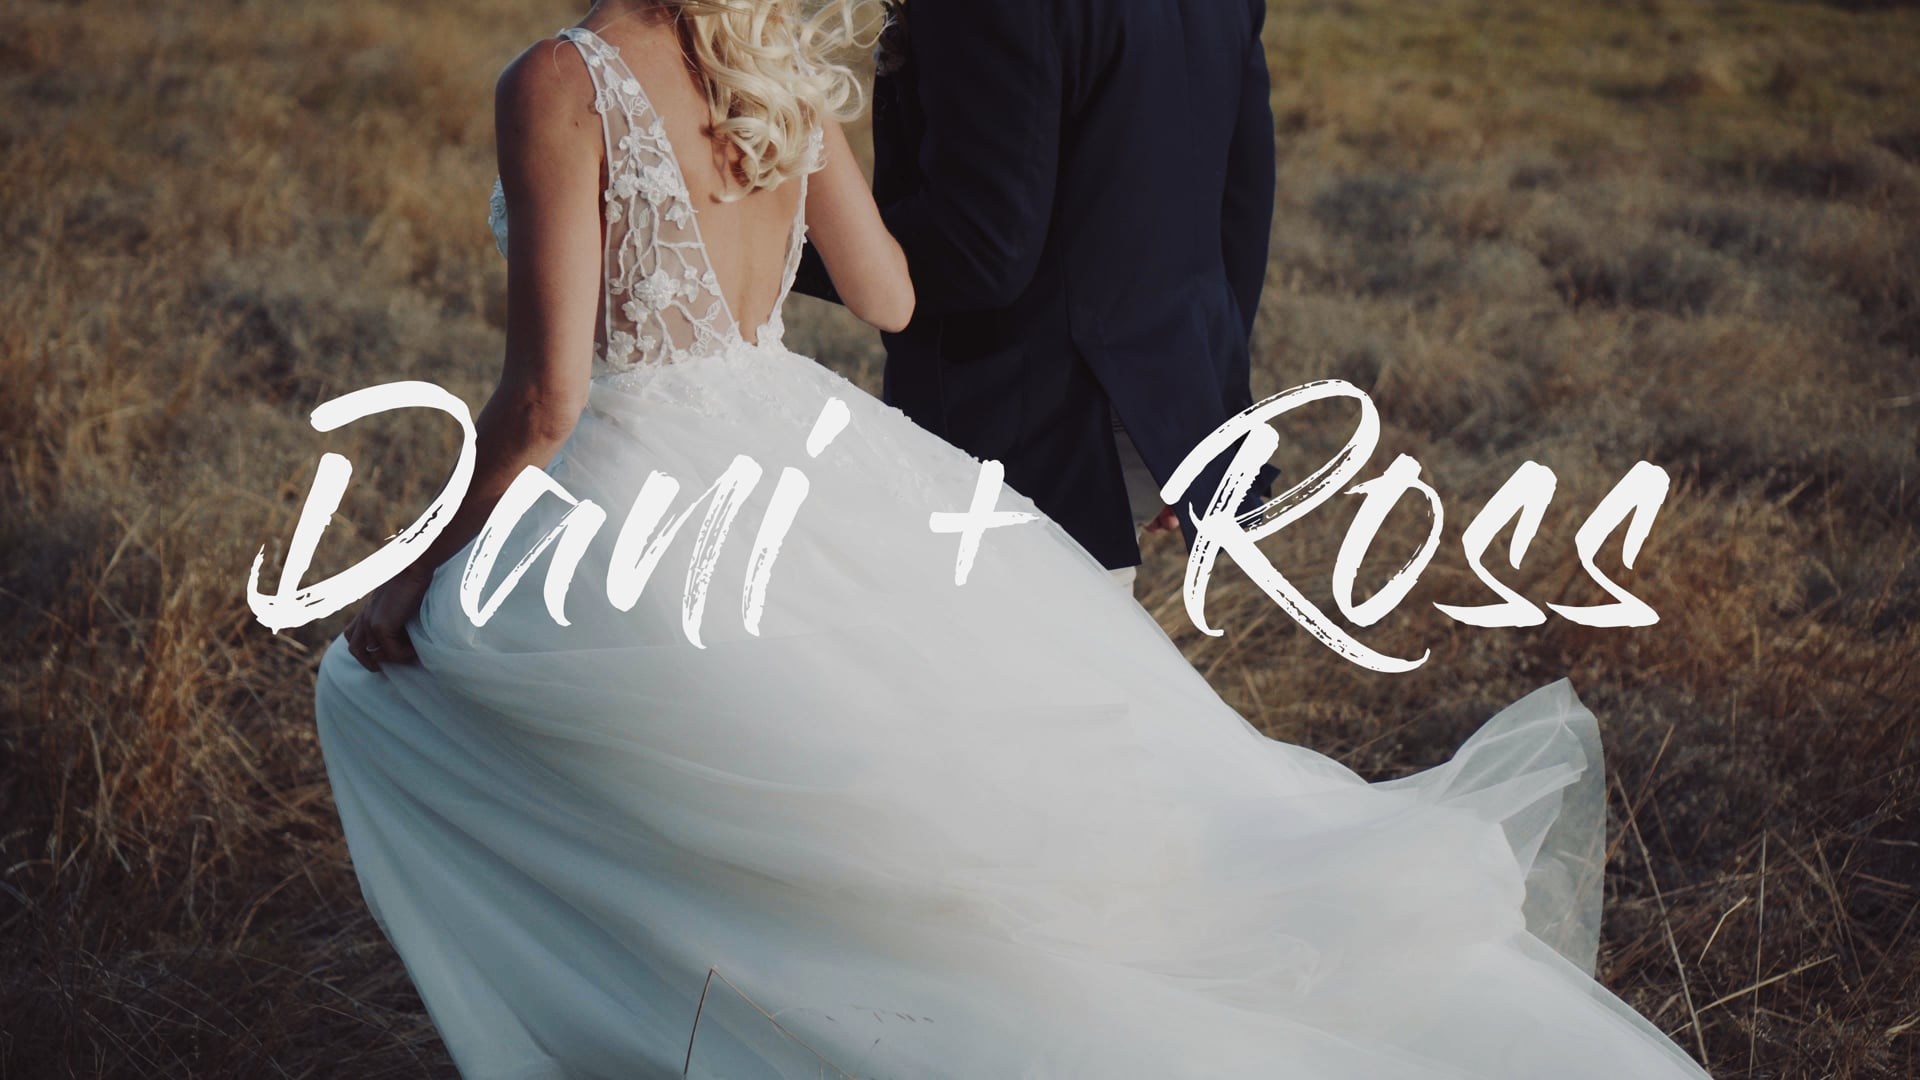 Dani + Ross - Cinematic FIlm